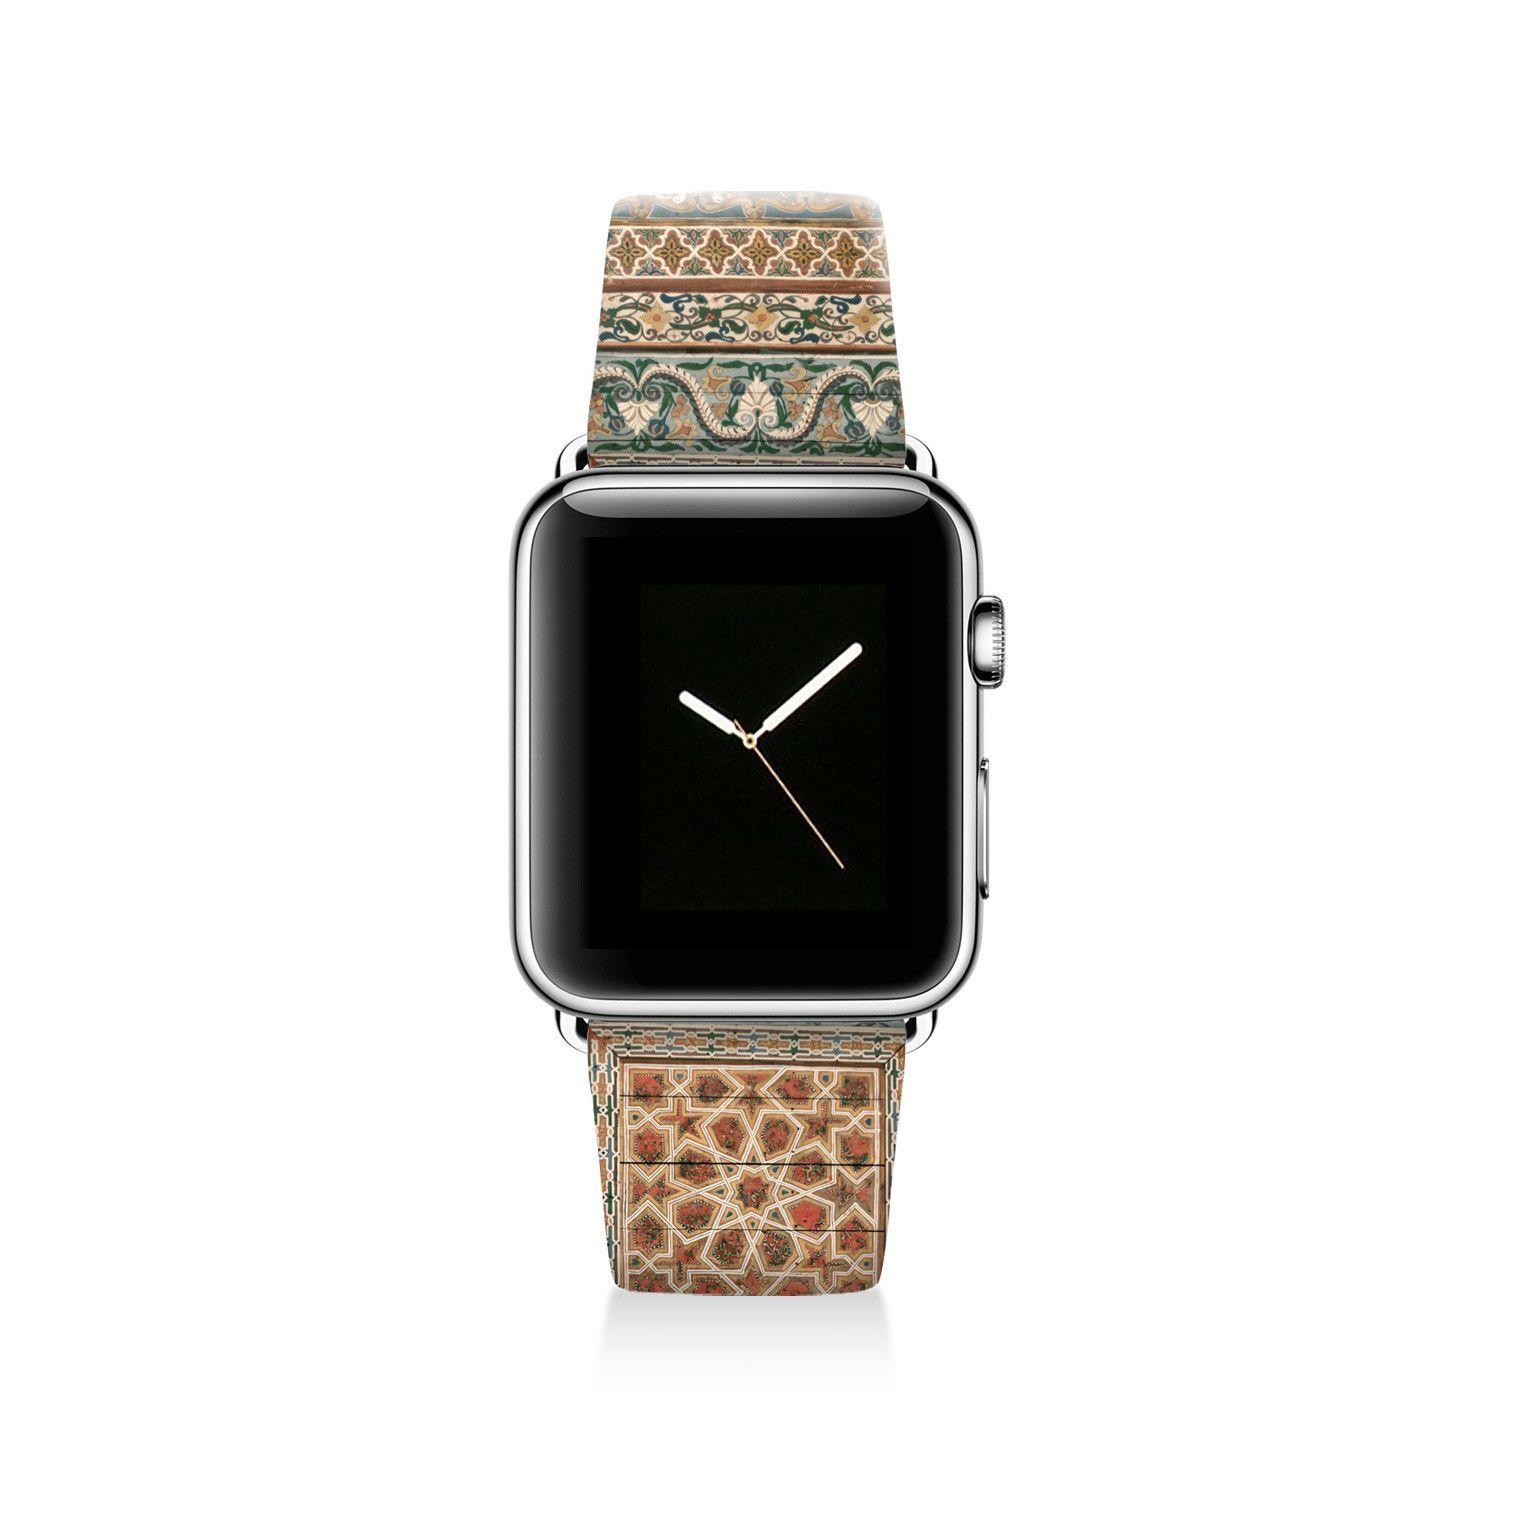 Persian Apple watch band, Decouart Apple watch strap S002